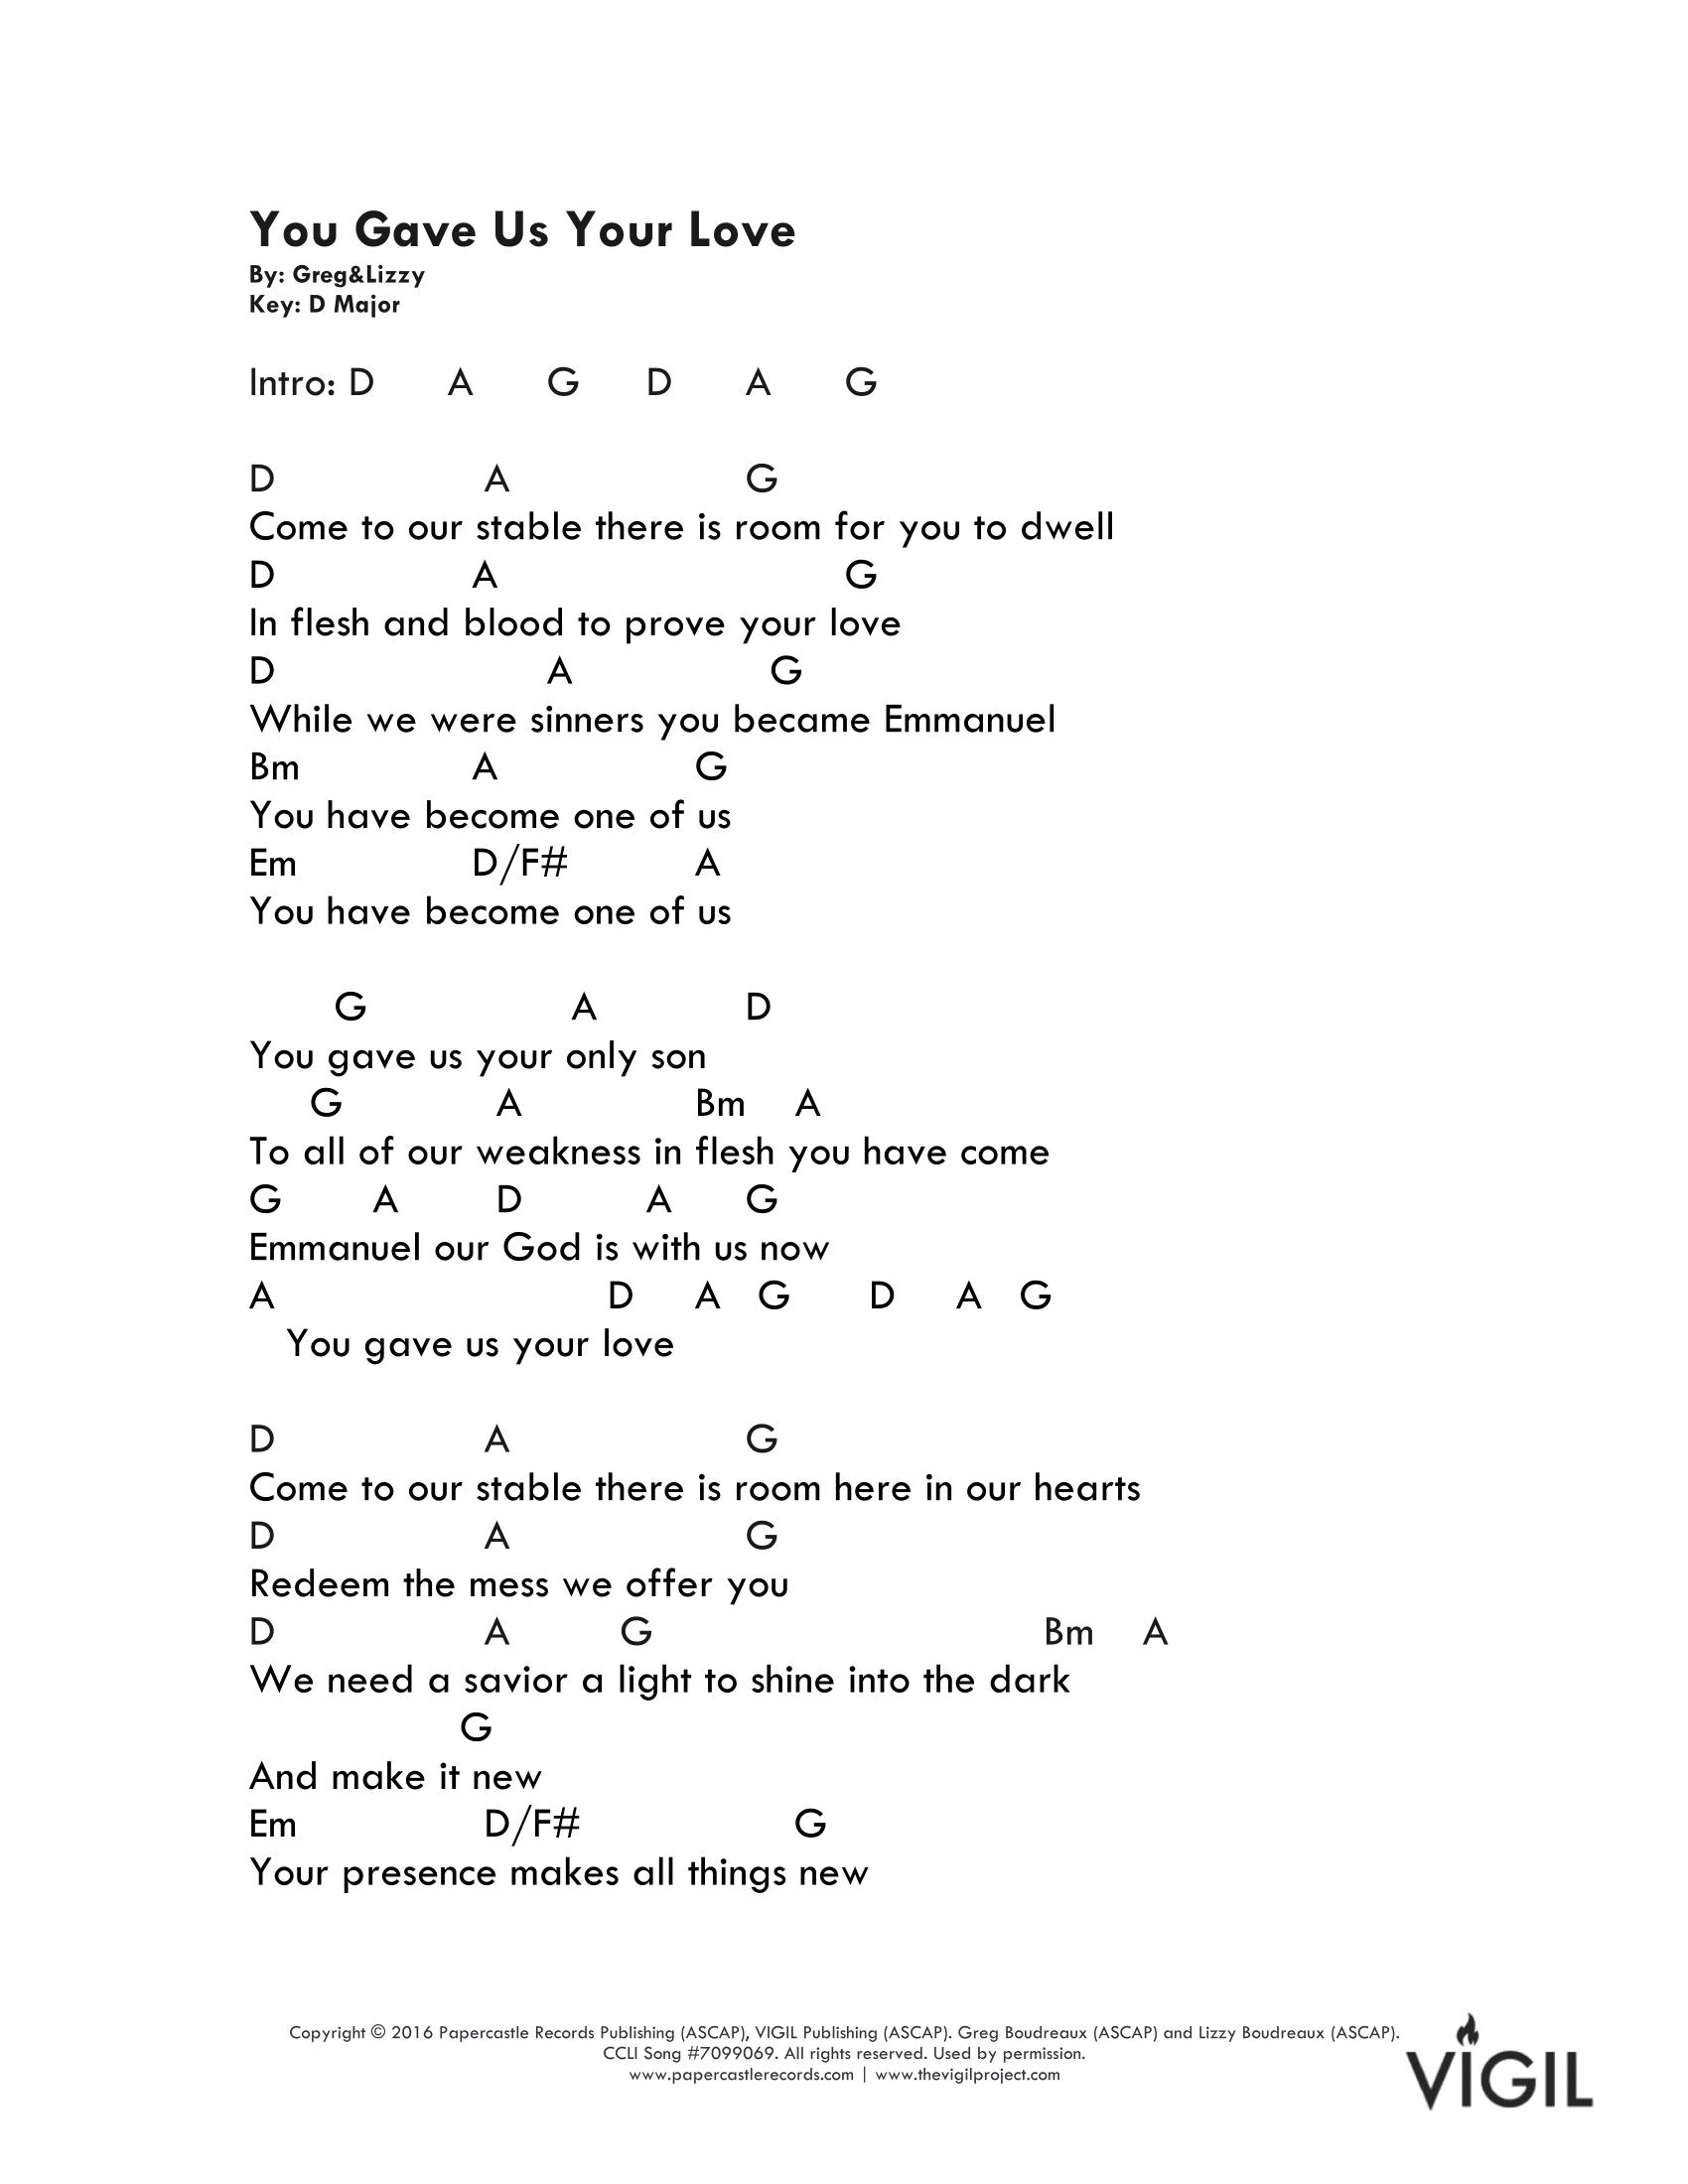 VIGIL S2 - You Gave Us Your Love (D Major)-1.png